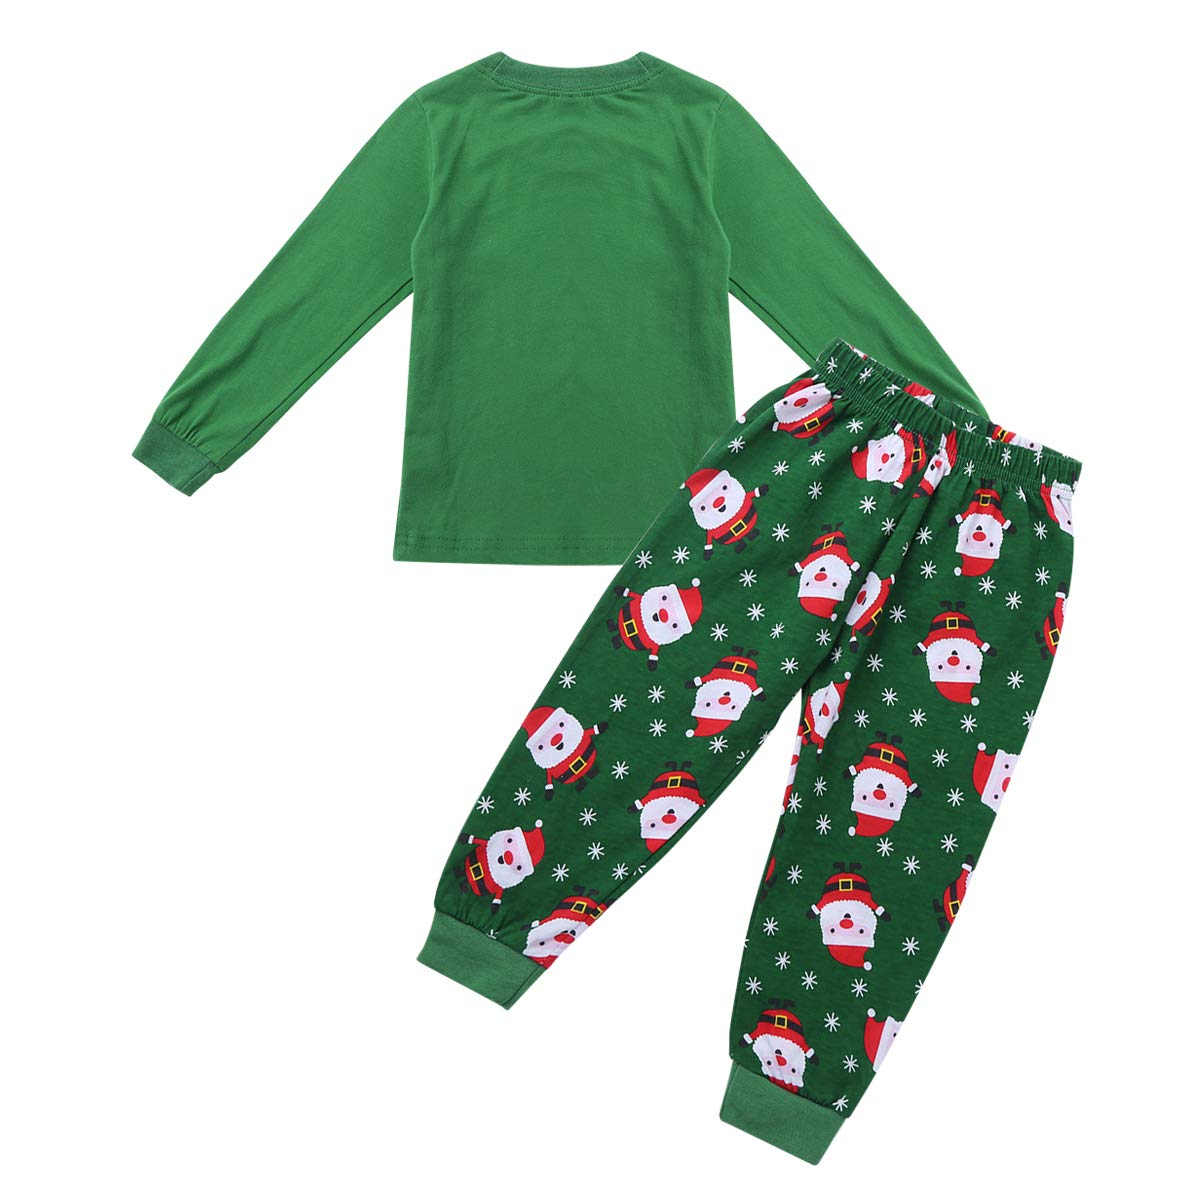 FEESHOW Kids Children Boys Girls Santa Claus Christmas Pajamas Pjs Sets Baby Toddlers Cotton Sleepwear